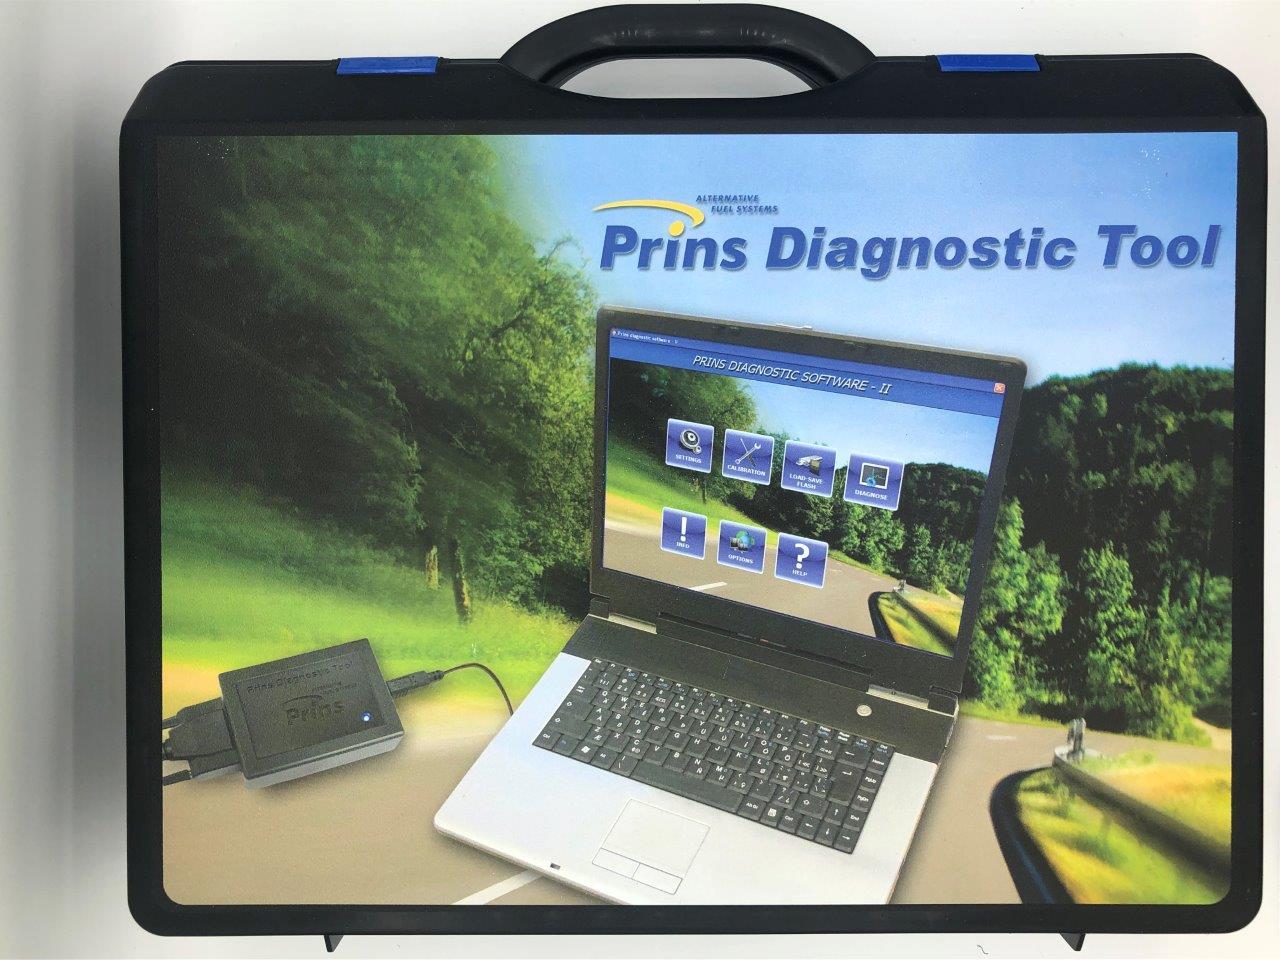 prins autogas diagnostic tool kit prins interface usb pdt. Black Bedroom Furniture Sets. Home Design Ideas